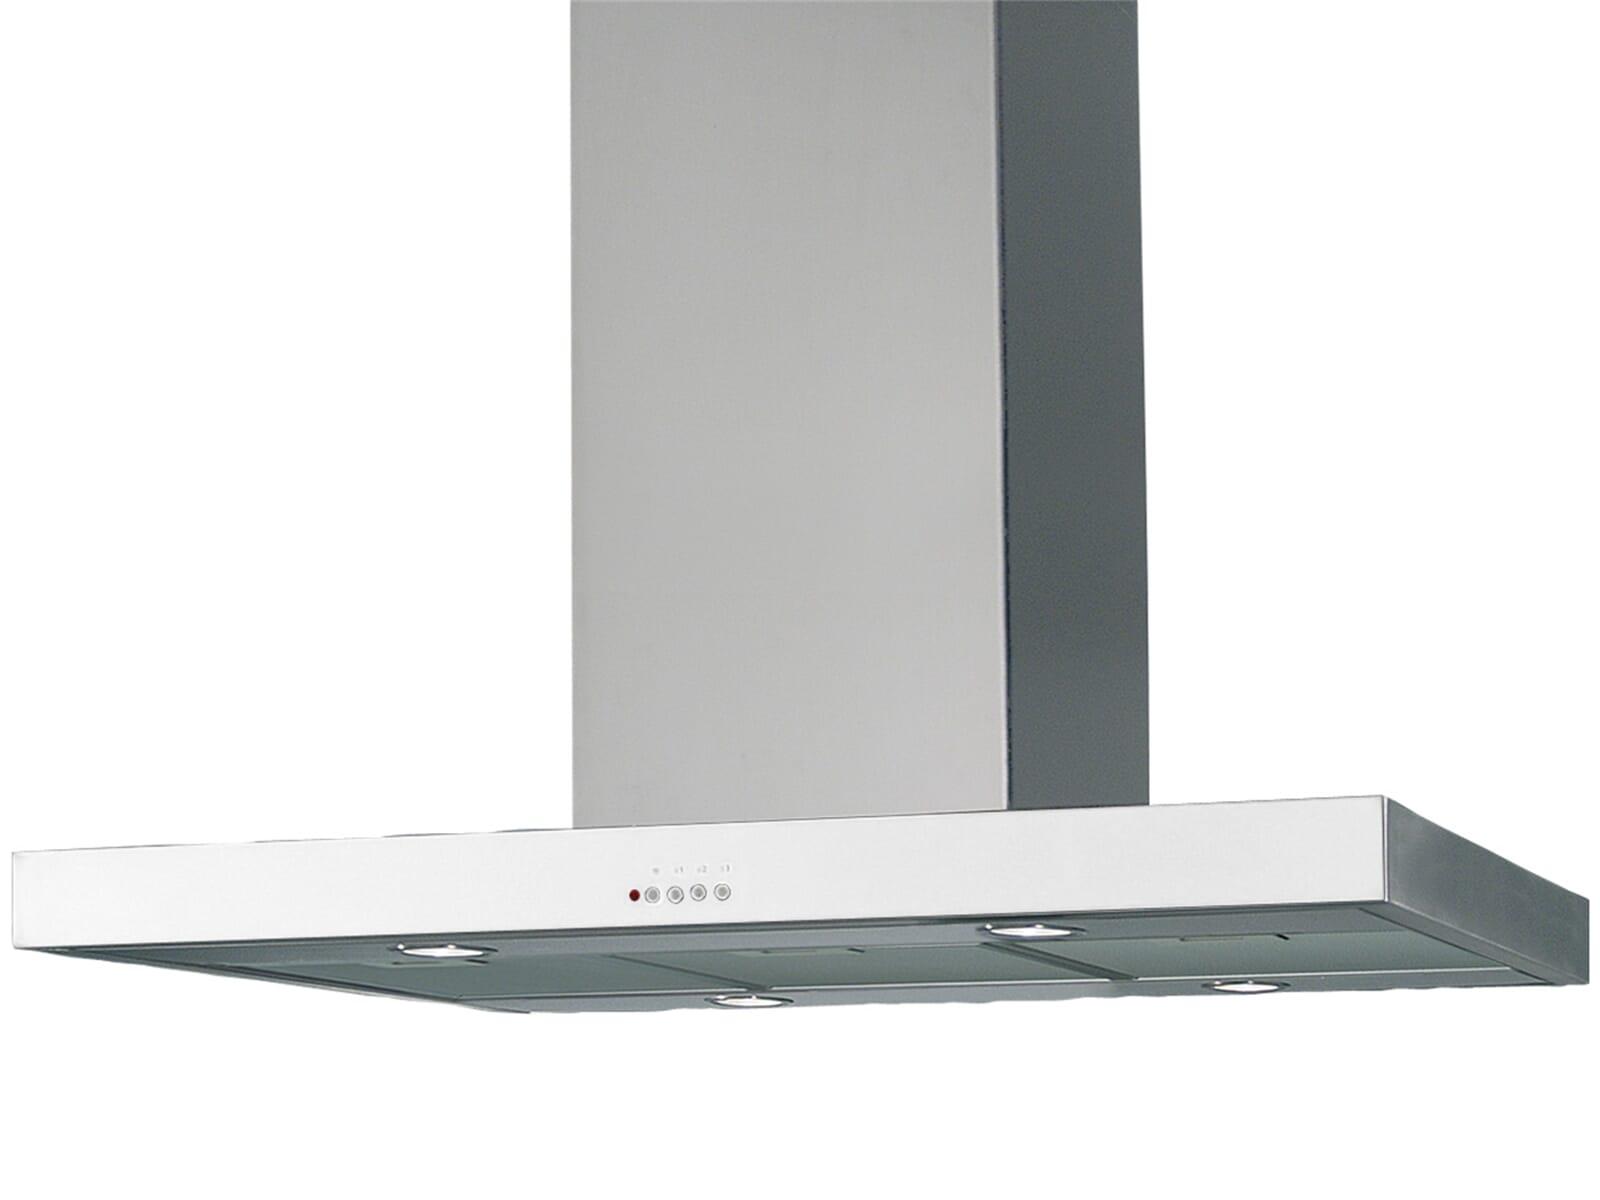 best tavolara bianco is 181 vw insel dunstabzugshaube wei f r 498 90 eur. Black Bedroom Furniture Sets. Home Design Ideas